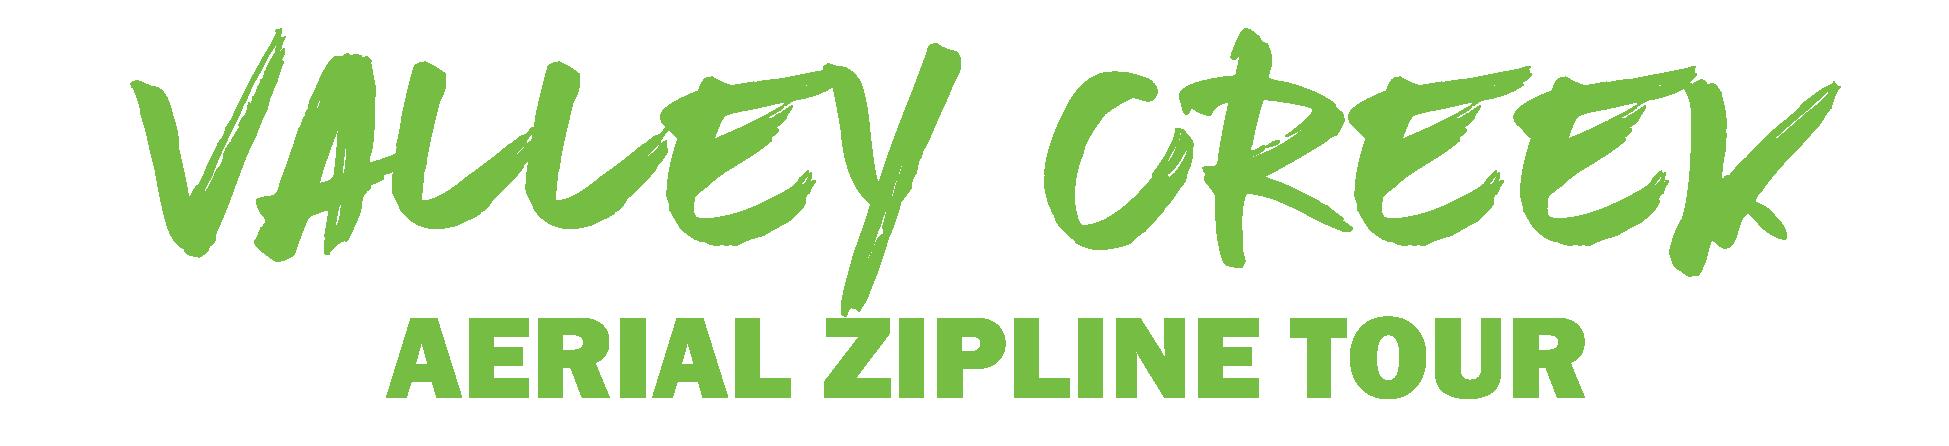 Valley Creek Logo-01